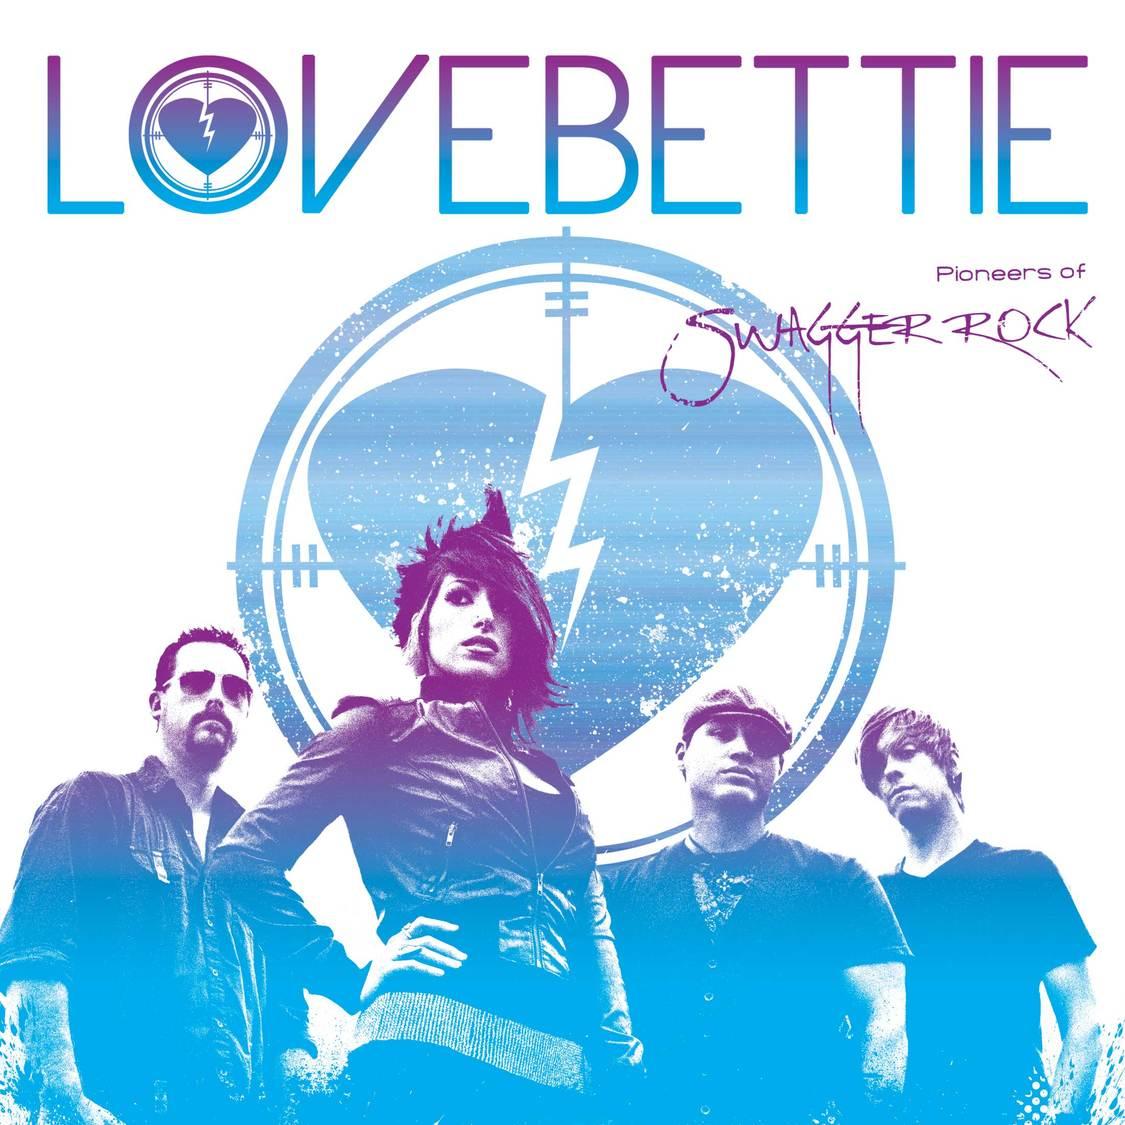 Music News: Pittsburgh's Band to Watch, Lovebettie – Local News